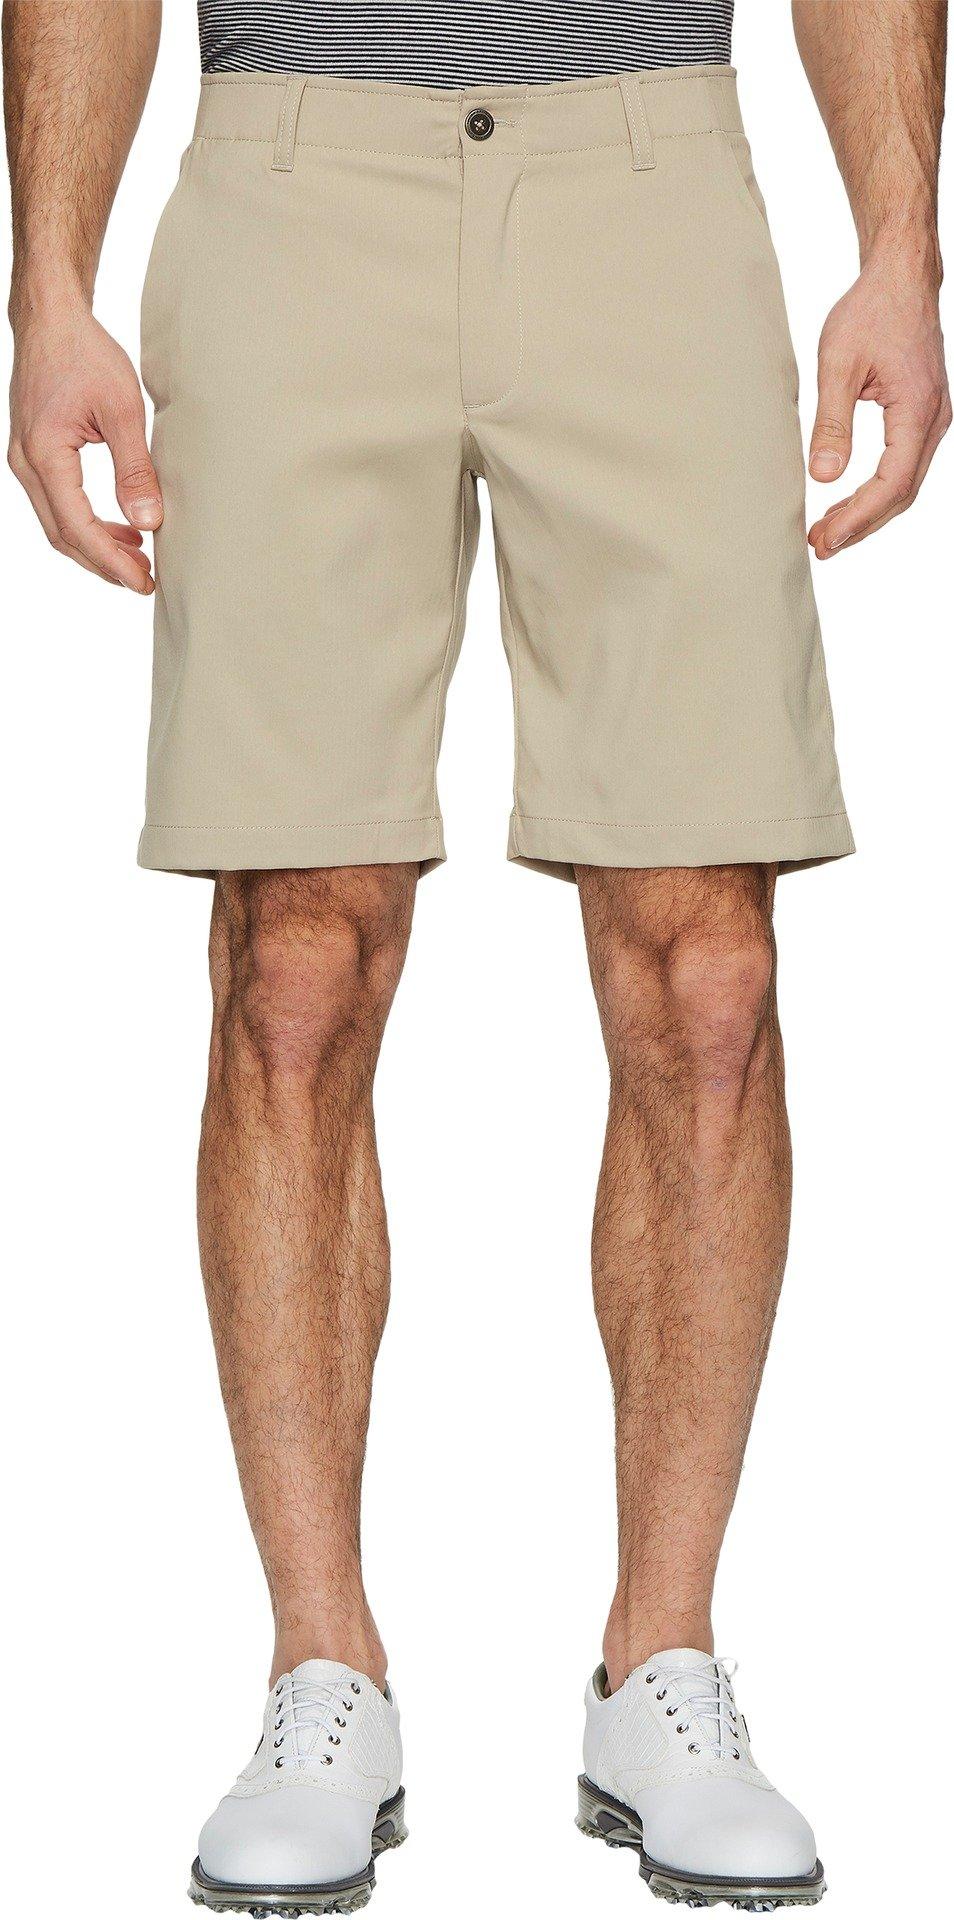 Under Armour Men's Showdown Golf Shorts, City Khaki (299)/City Khaki, 34 by Under Armour